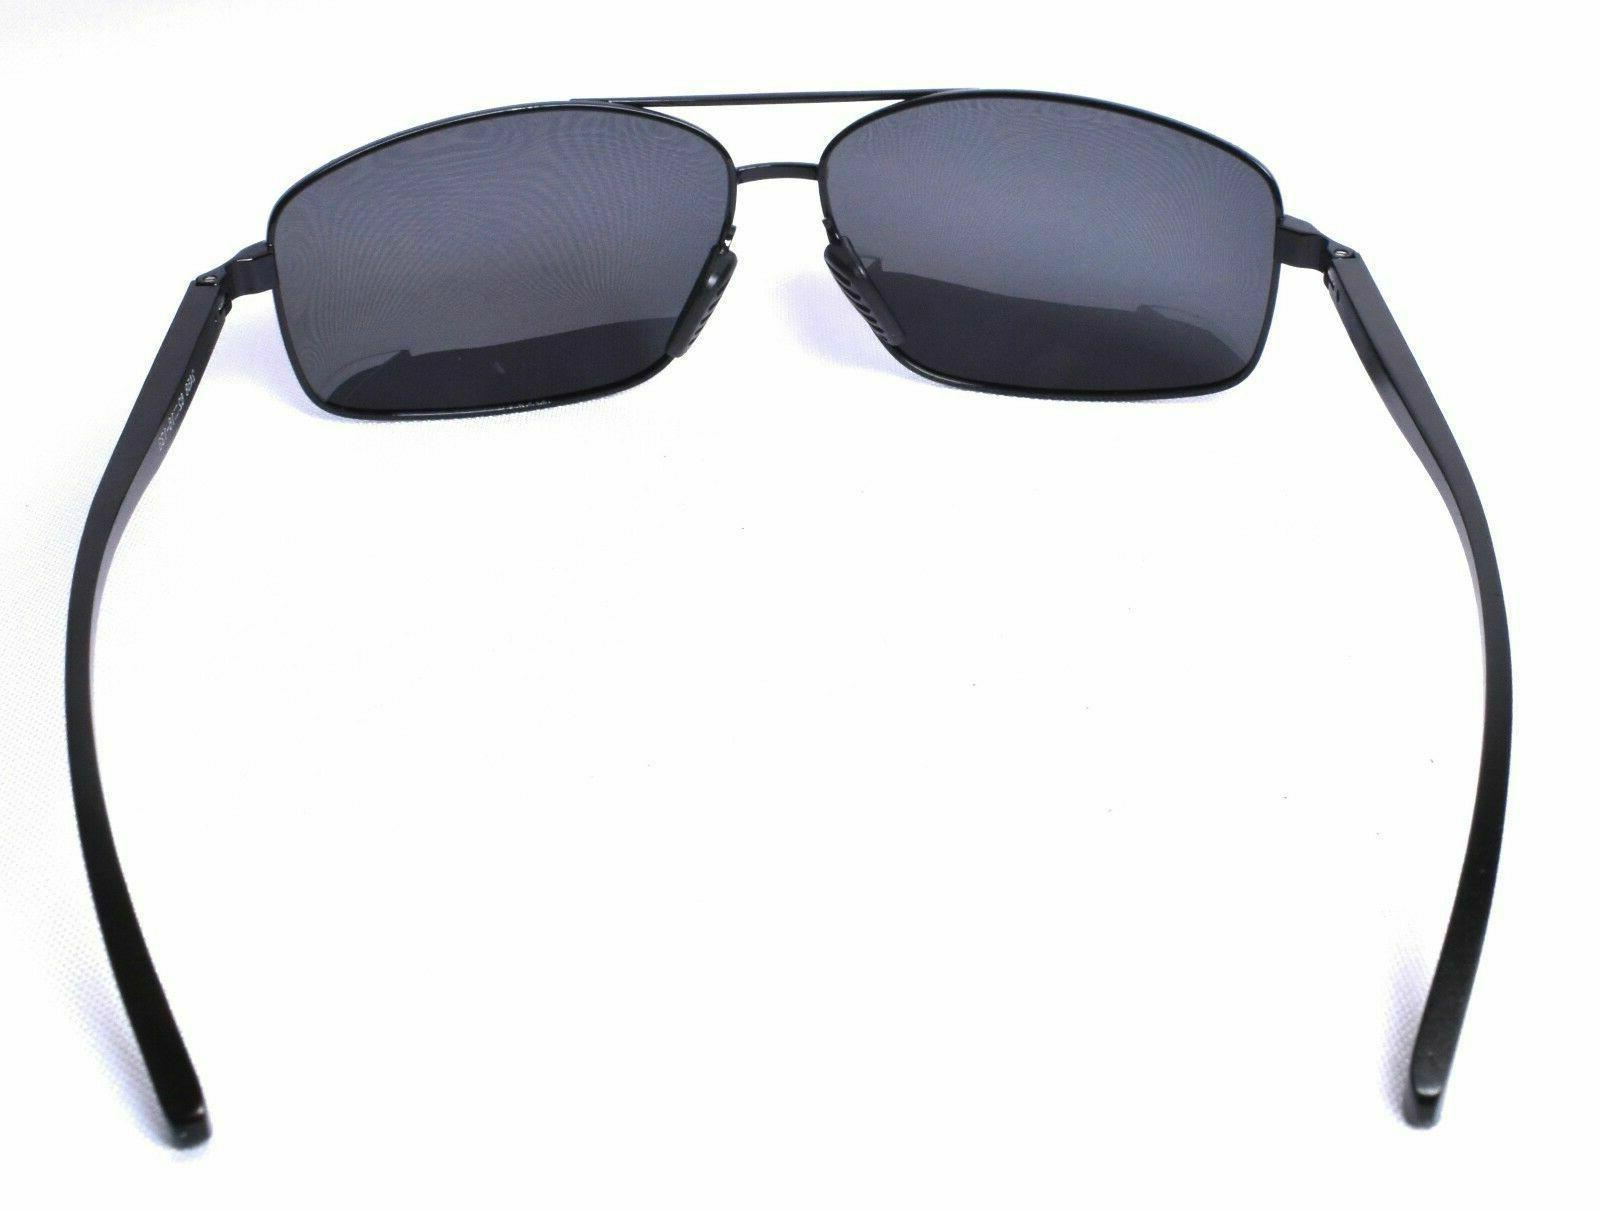 2458 black sunglasses 62 16 133